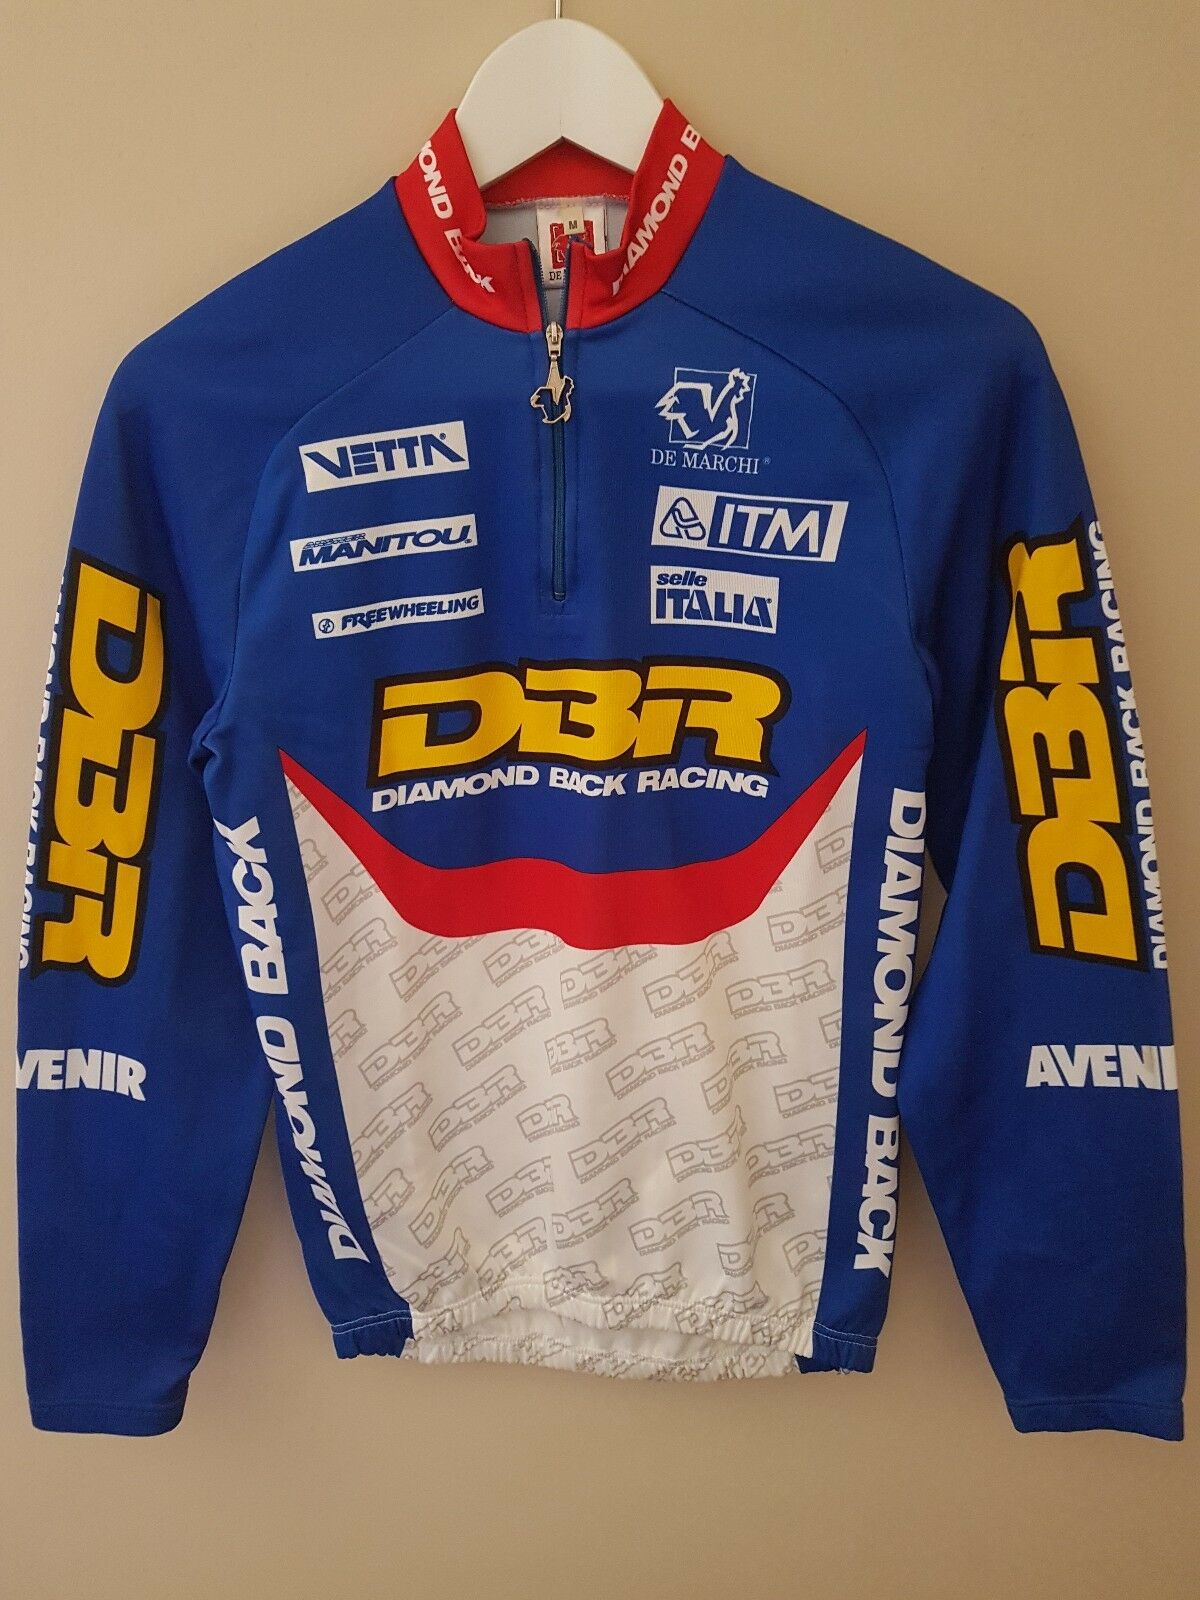 Maillot ciclismo mtb diamond back racing dbr nos vintage Dimensione m